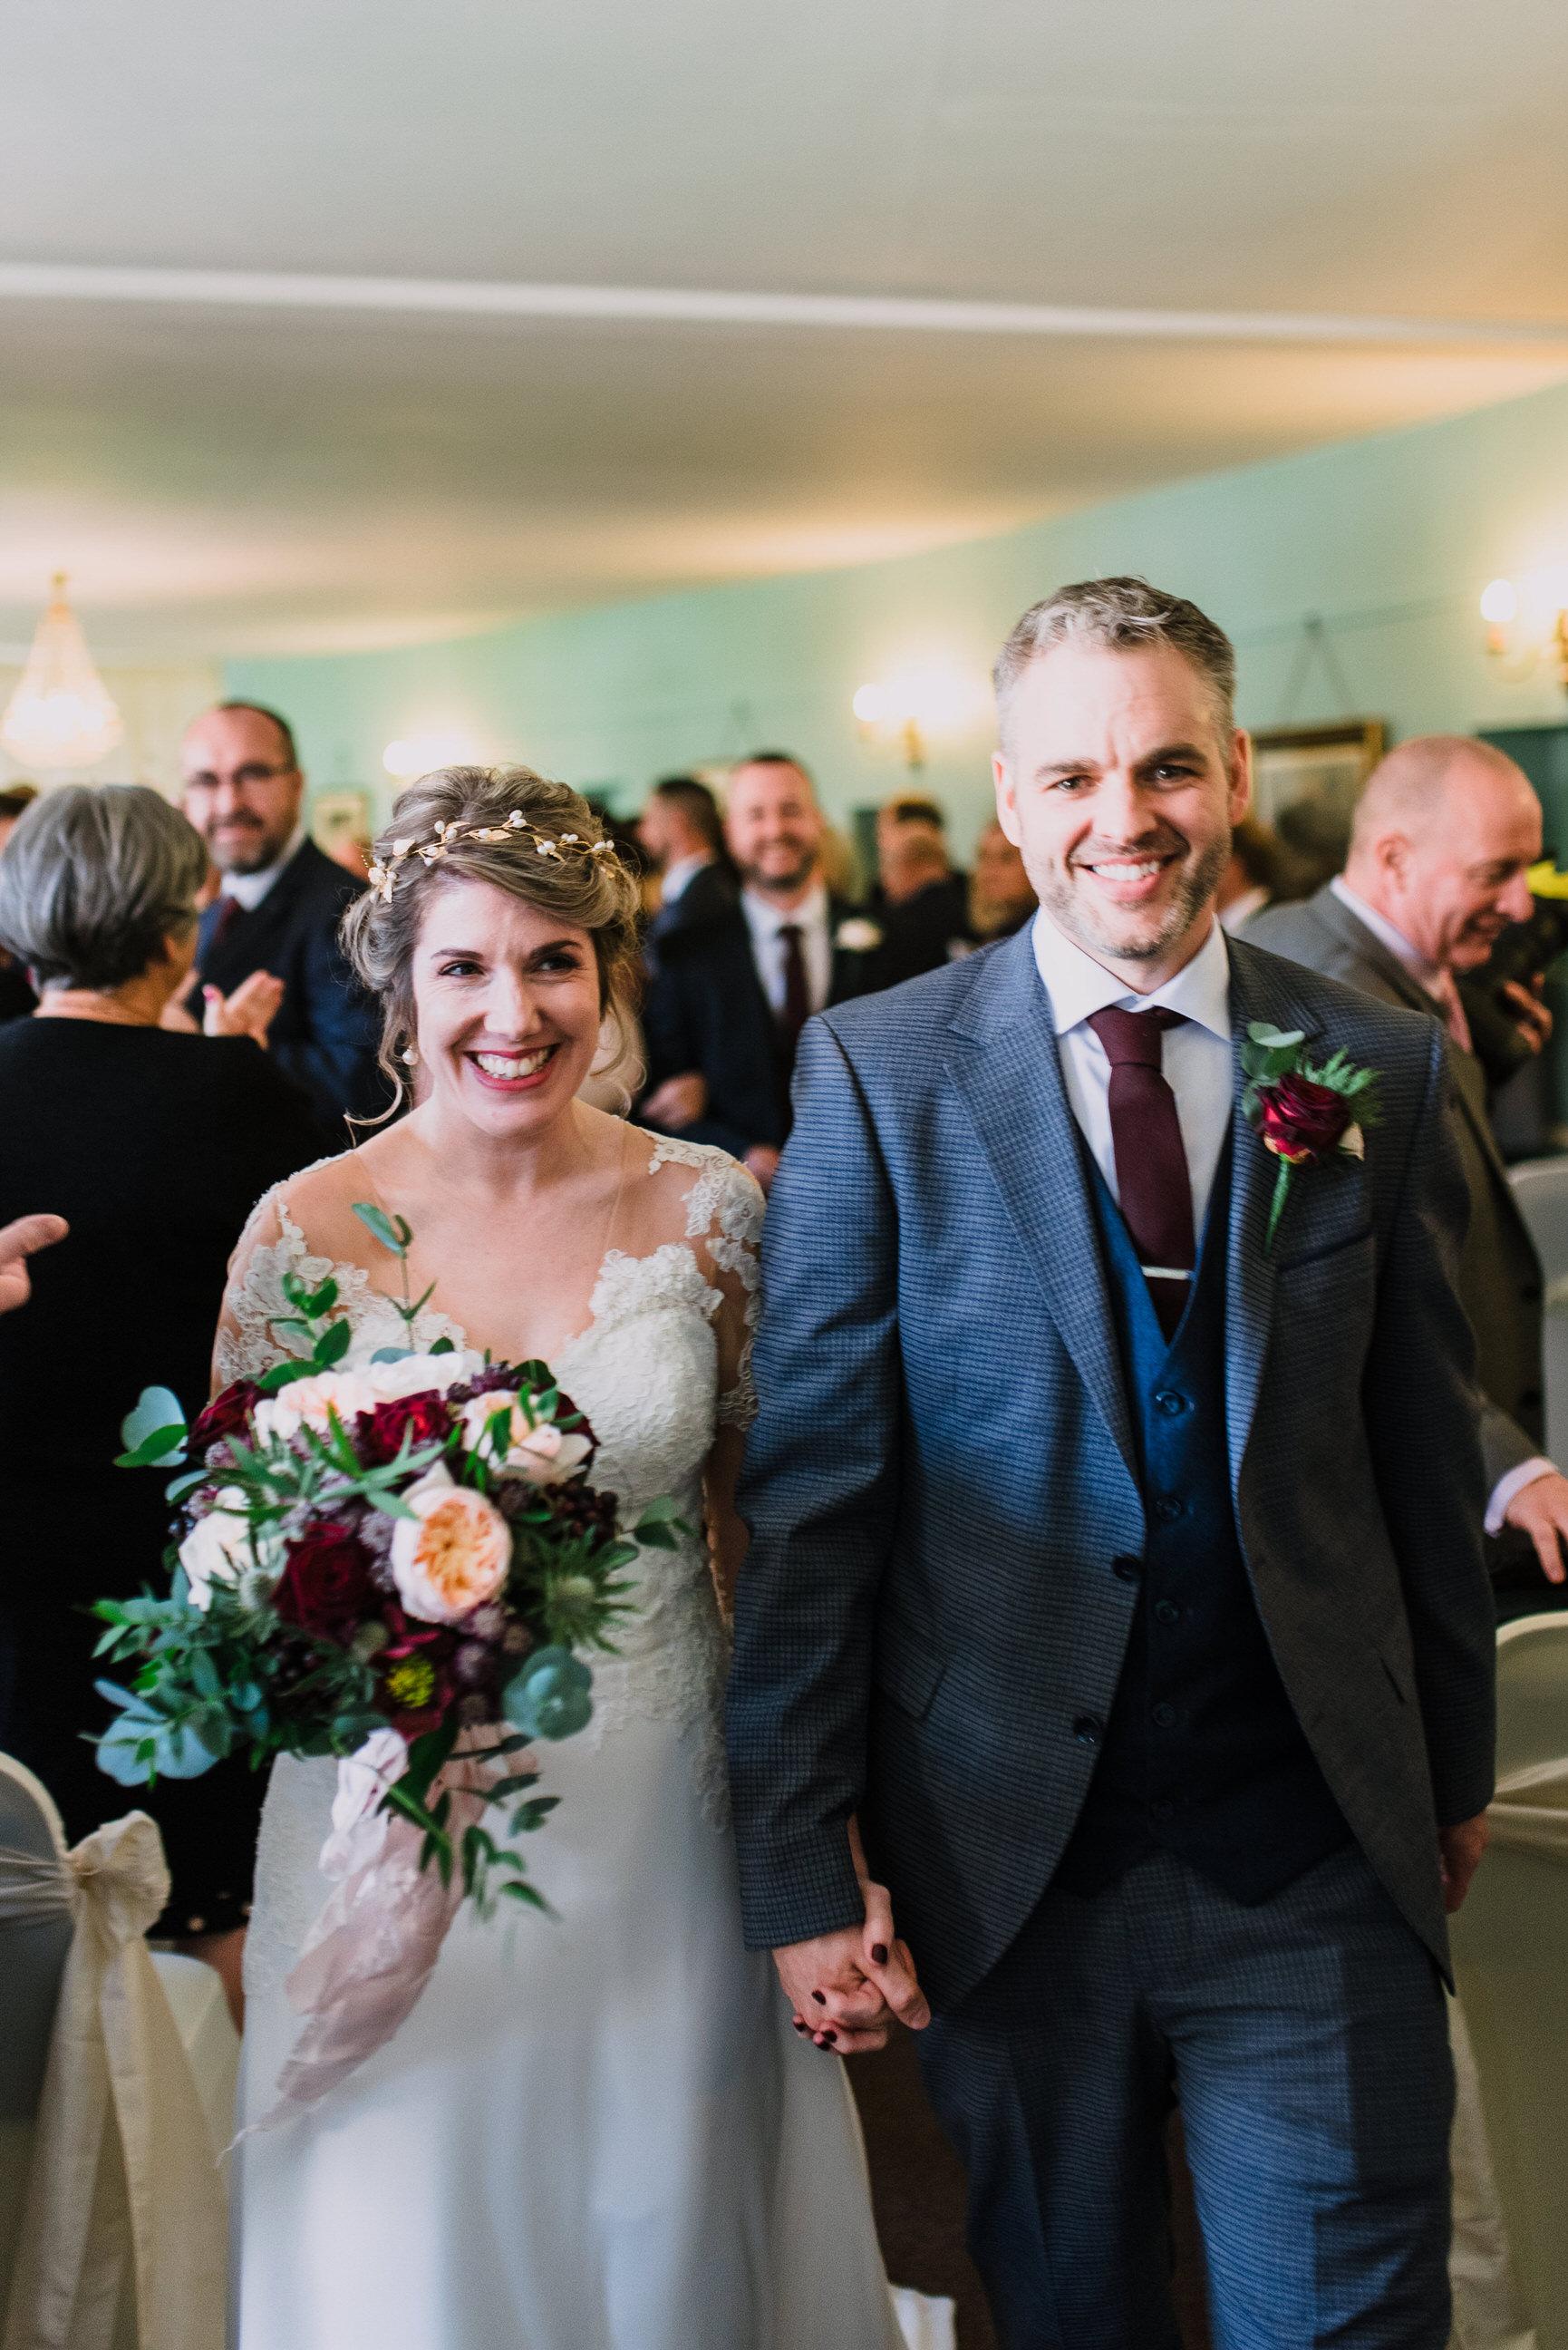 lissanoure castle wedding, northern ireland wedding photographer, romantic northern irish wedding venue, castle wedding ireland, natural wedding photography ni (67).jpg